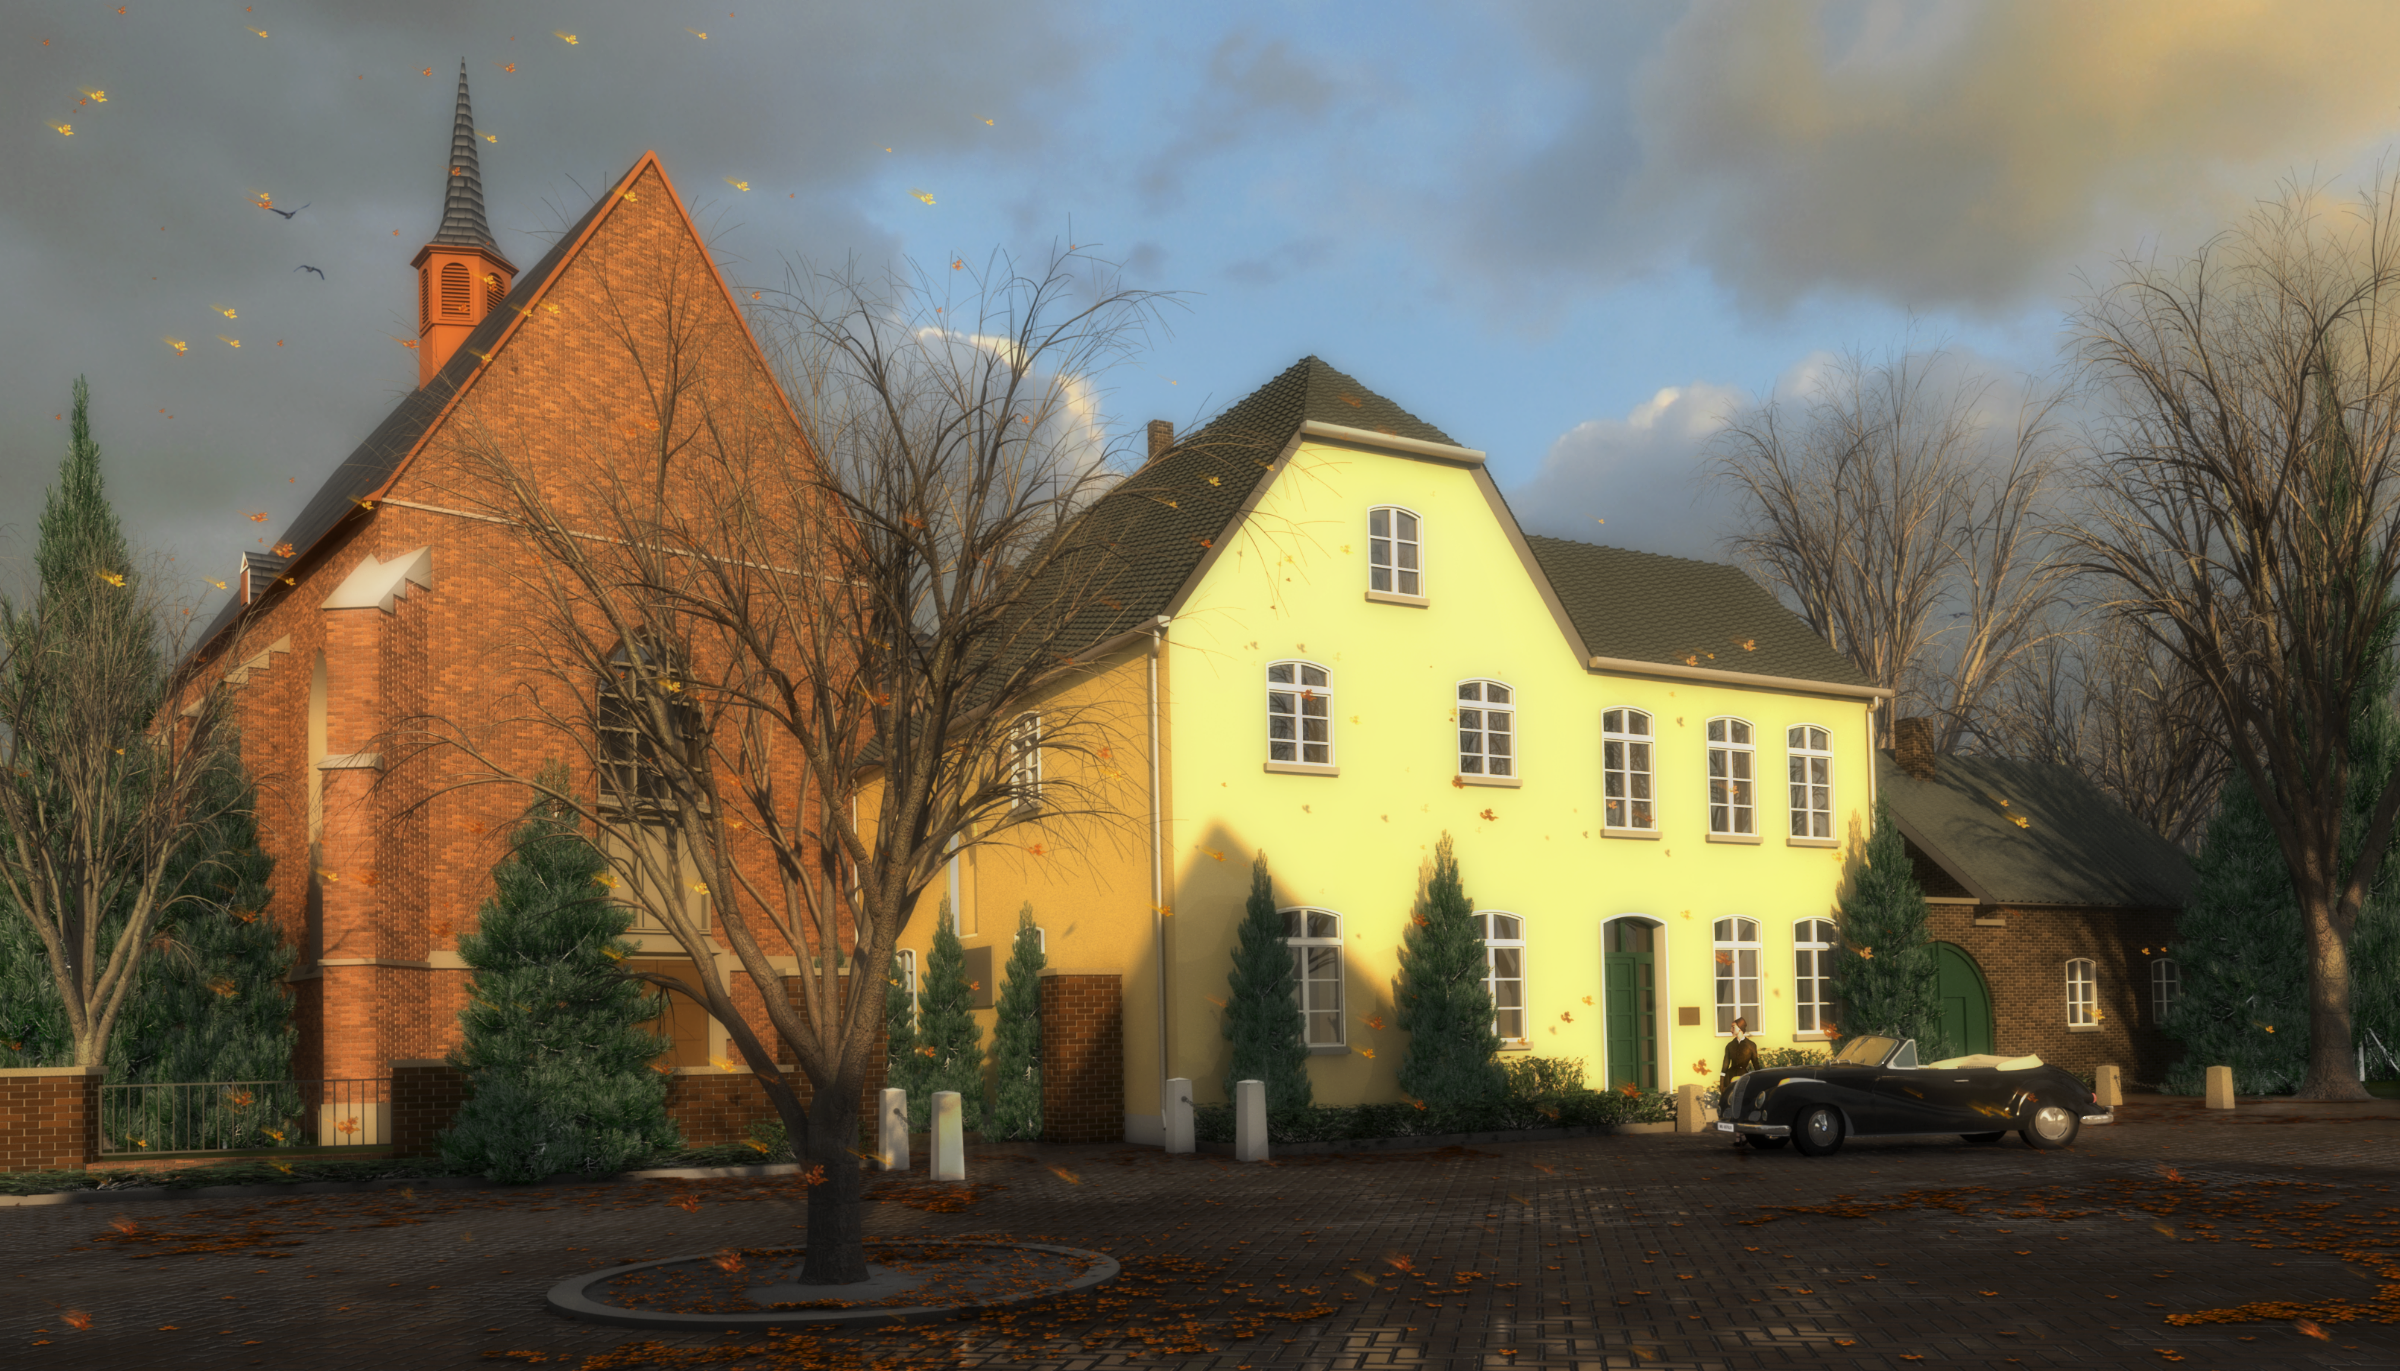 2019__I367550_GERMAN-MUSEUM_TIMF-10_0004_Flattened.png